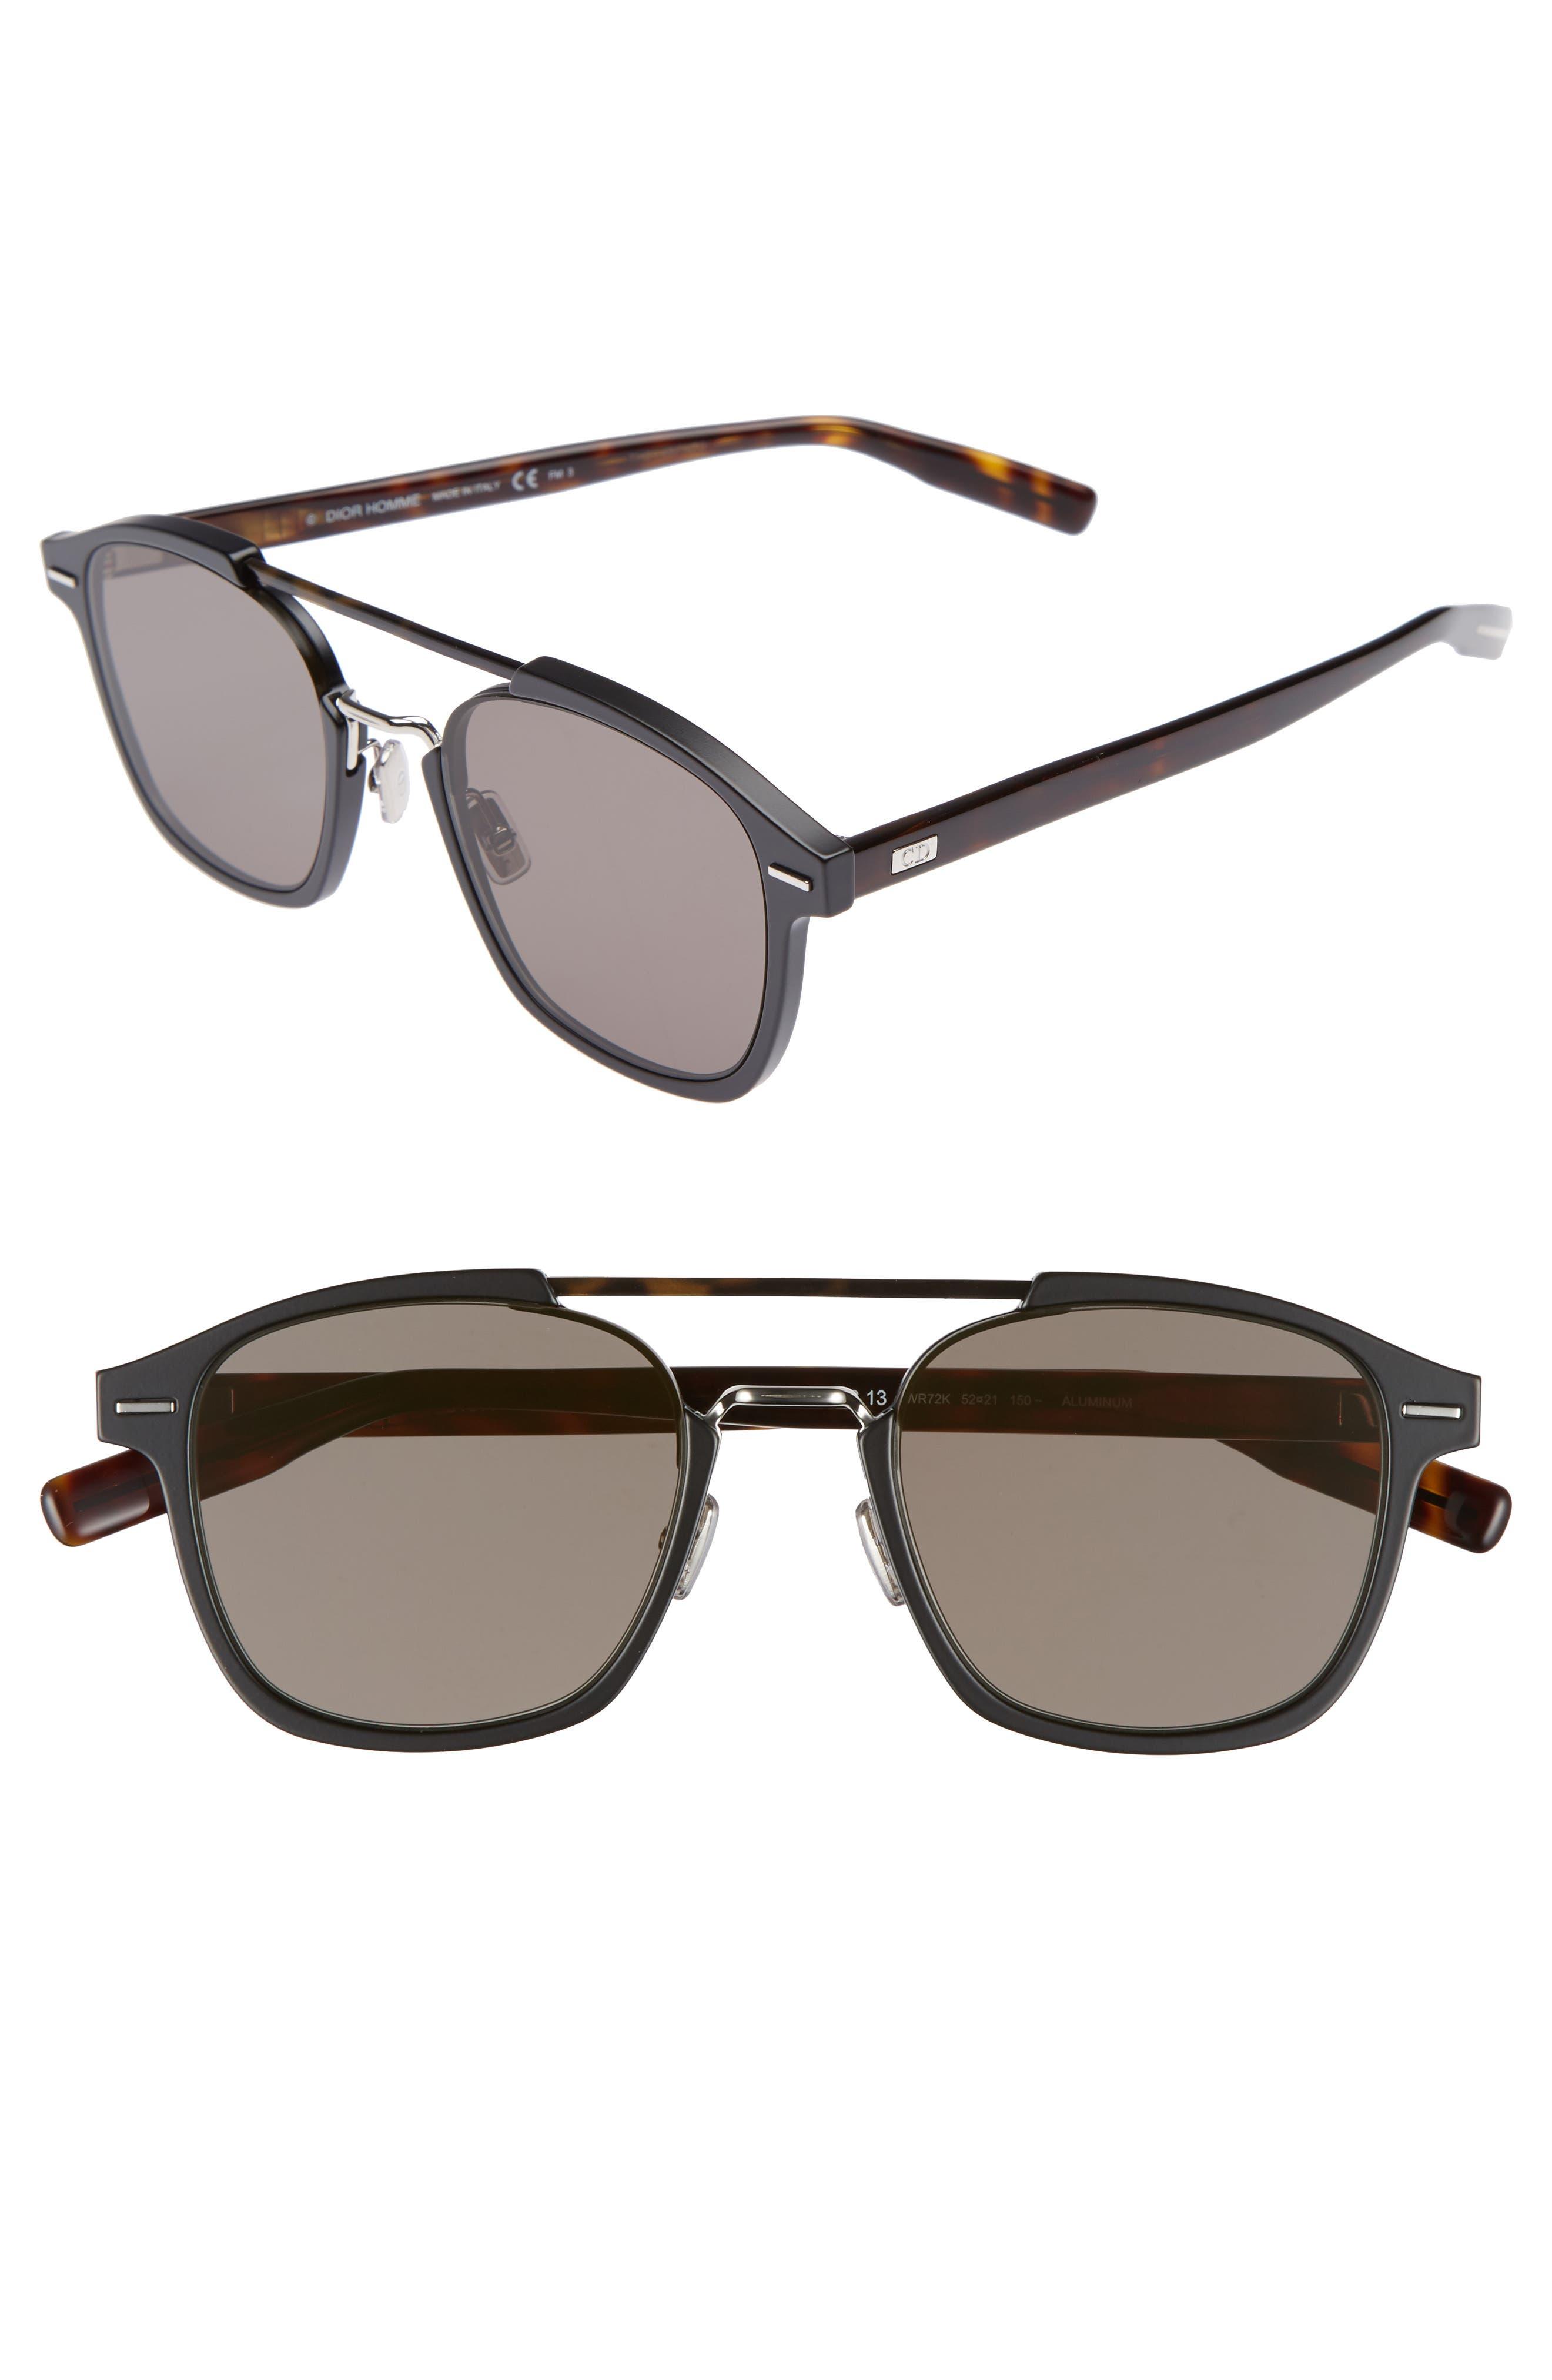 Dior Homme AL13.13 52mm Sunglasses